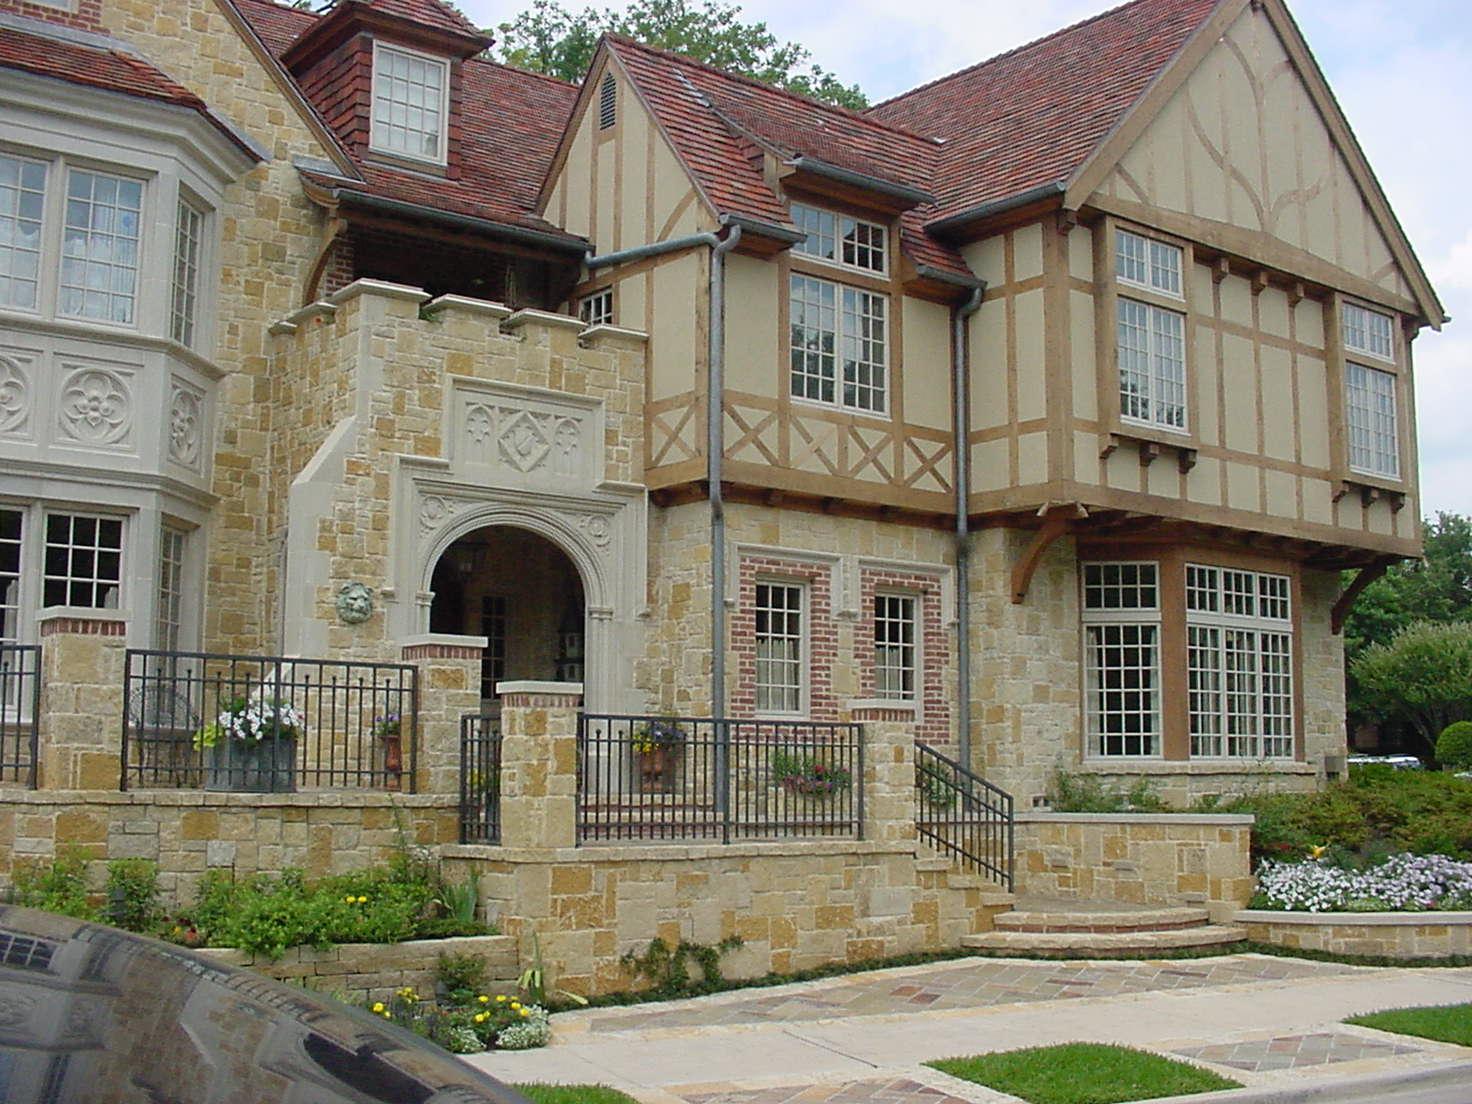 R107: Dallas Residence